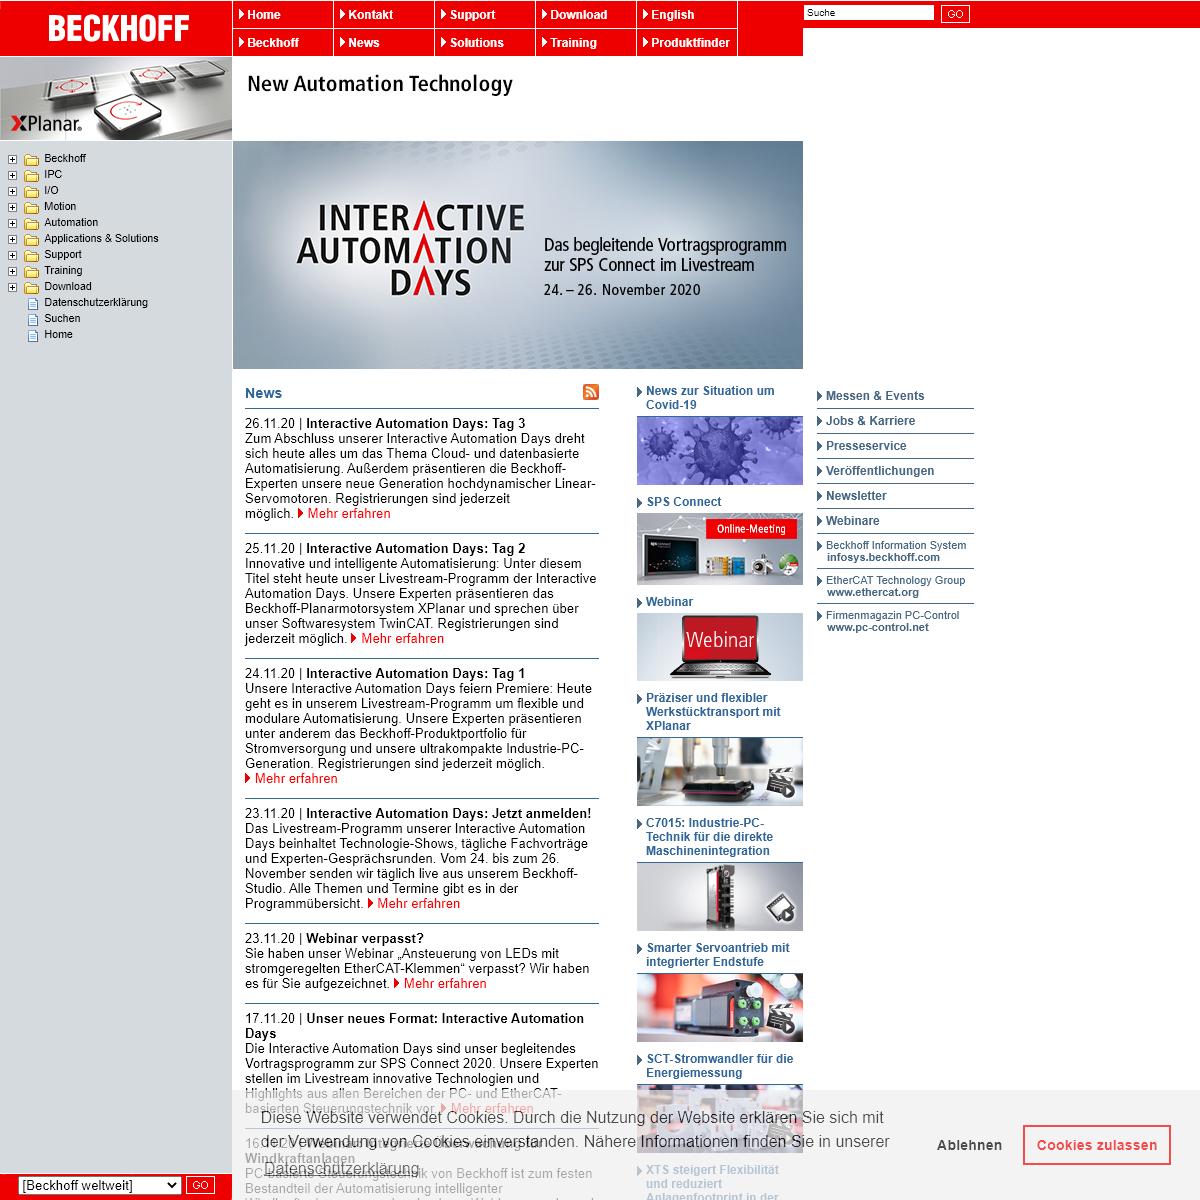 BECKHOFF New Automation Technology